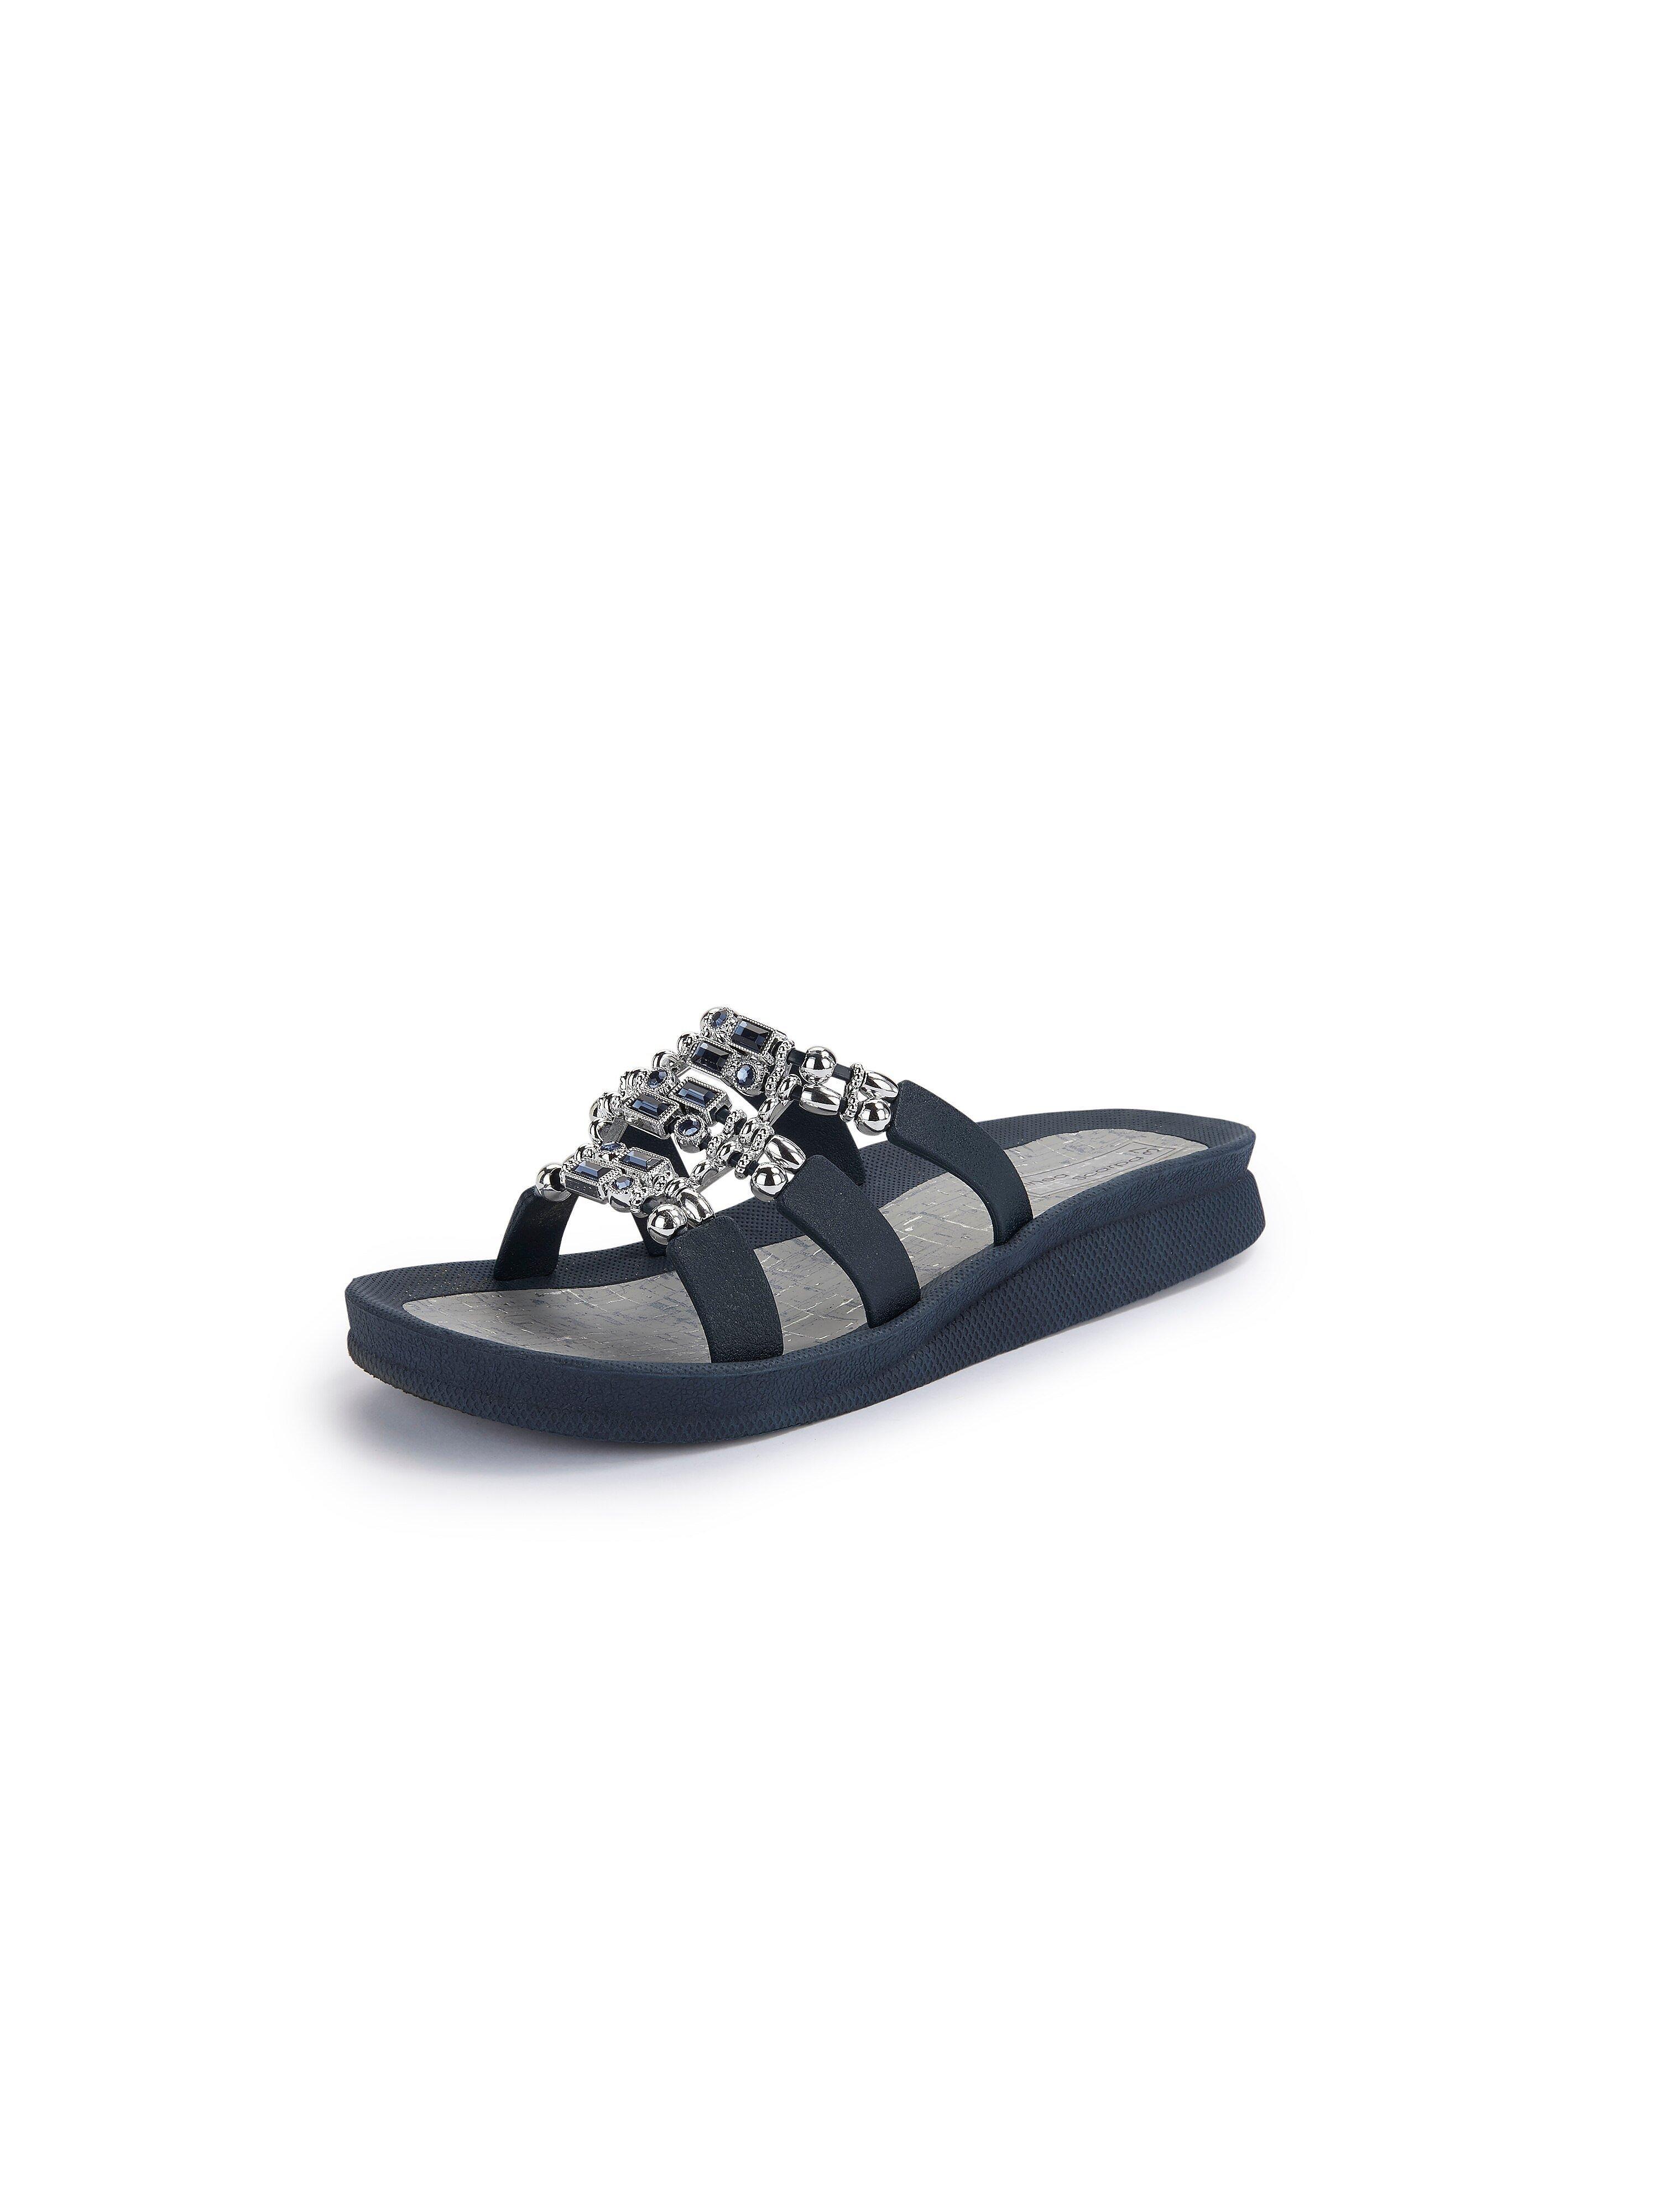 Badepantolette Linea Scarpa mehrfarbig | Schuhe > Badeschuhe | Linea Scarpa